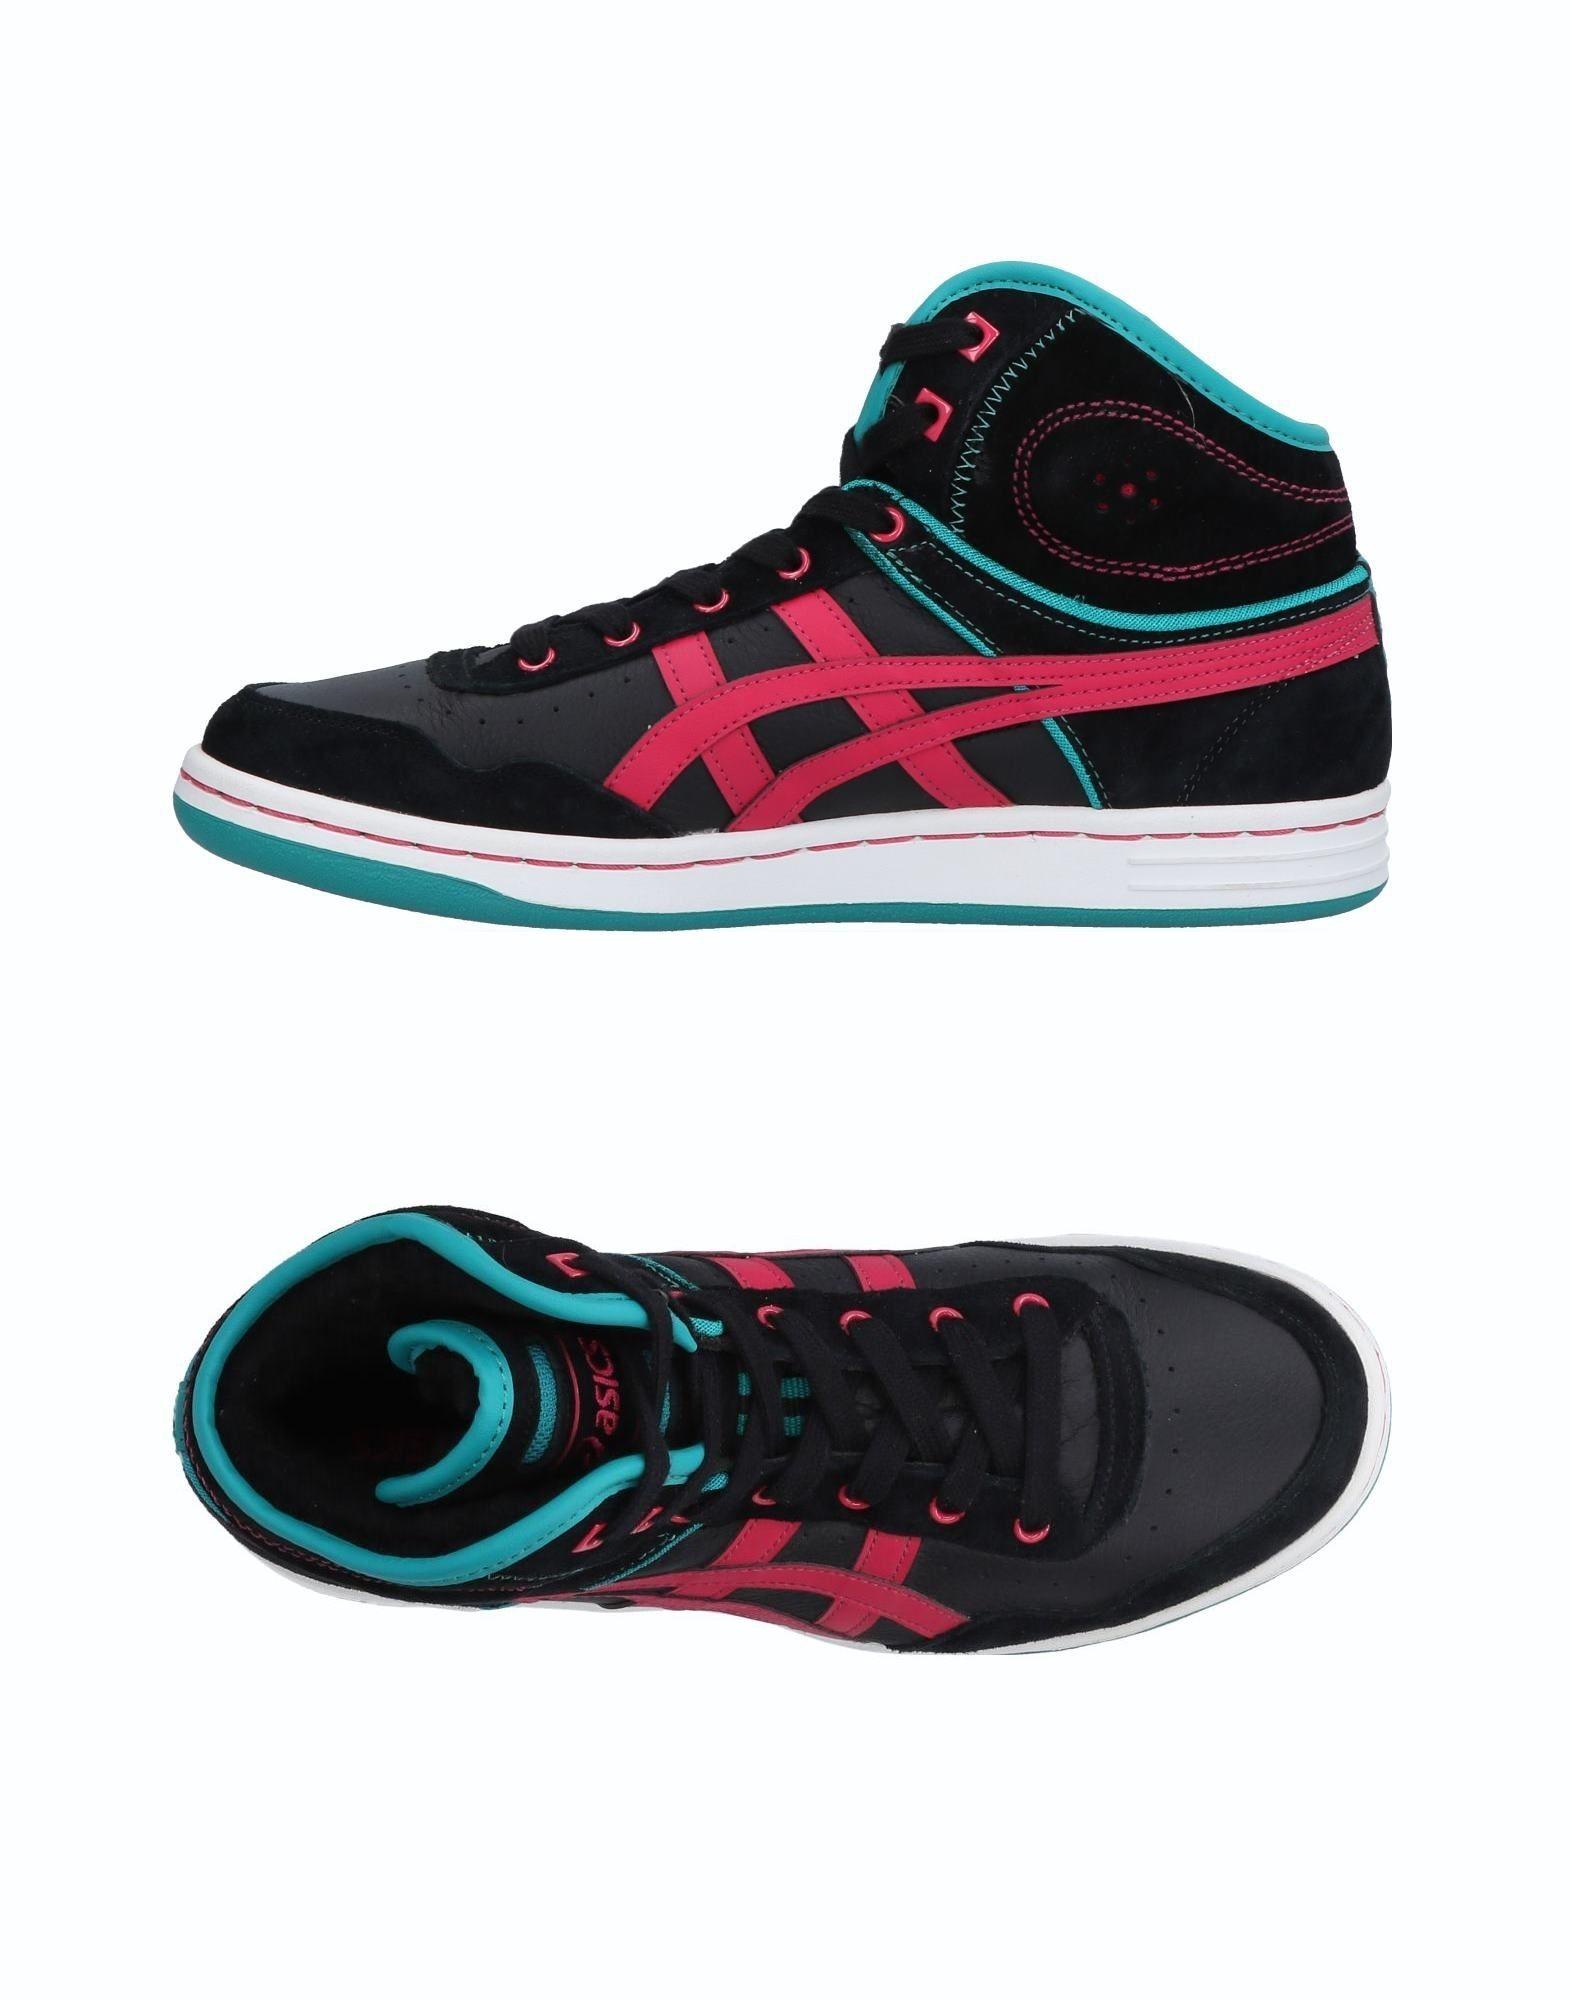 Asics Sneakers Damen  11506118IN Gute Qualität beliebte Schuhe